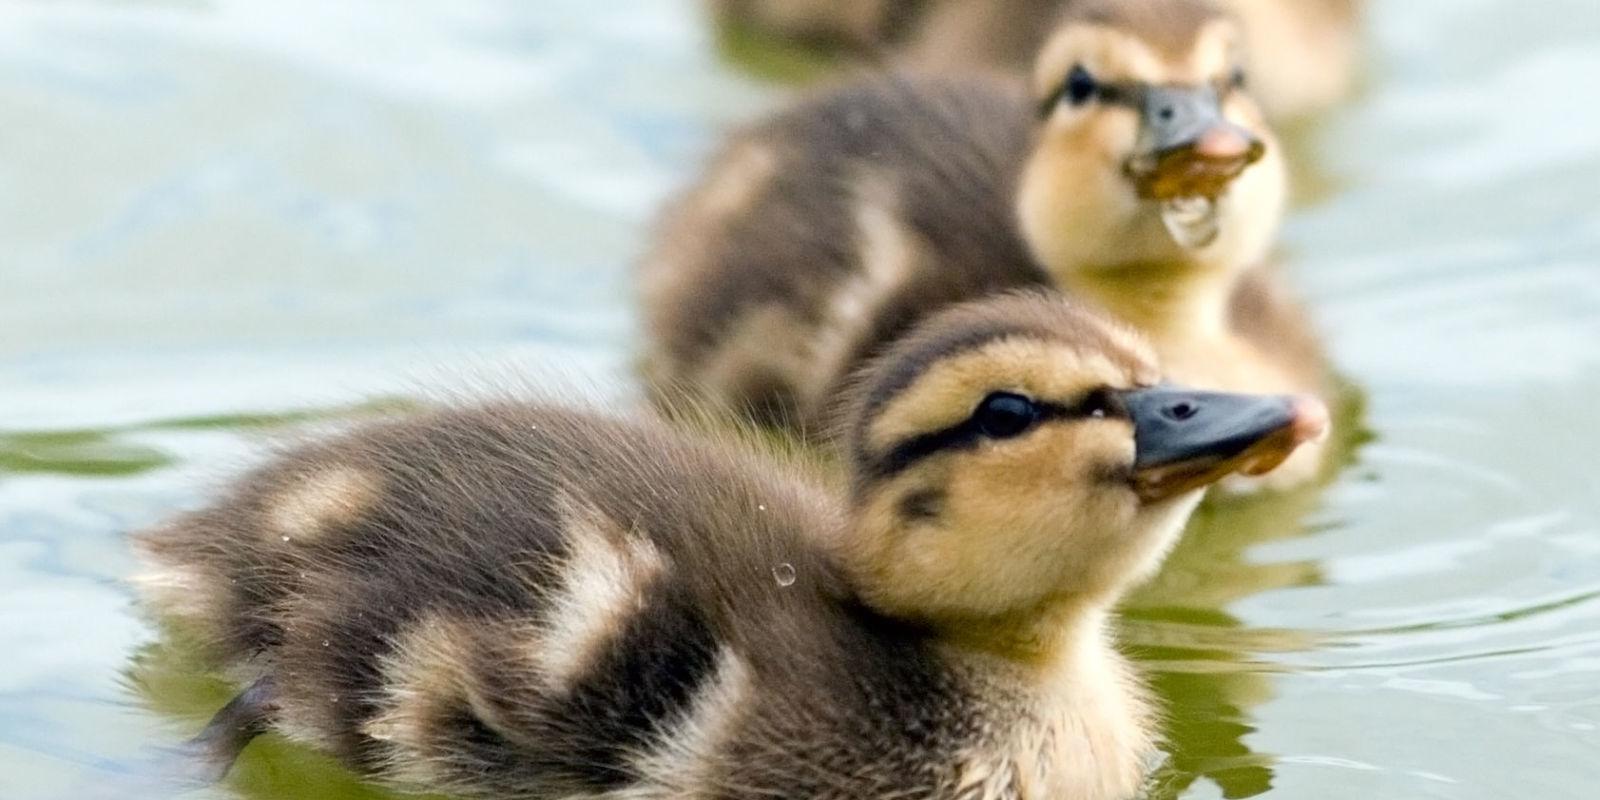 How To Keep Ducks